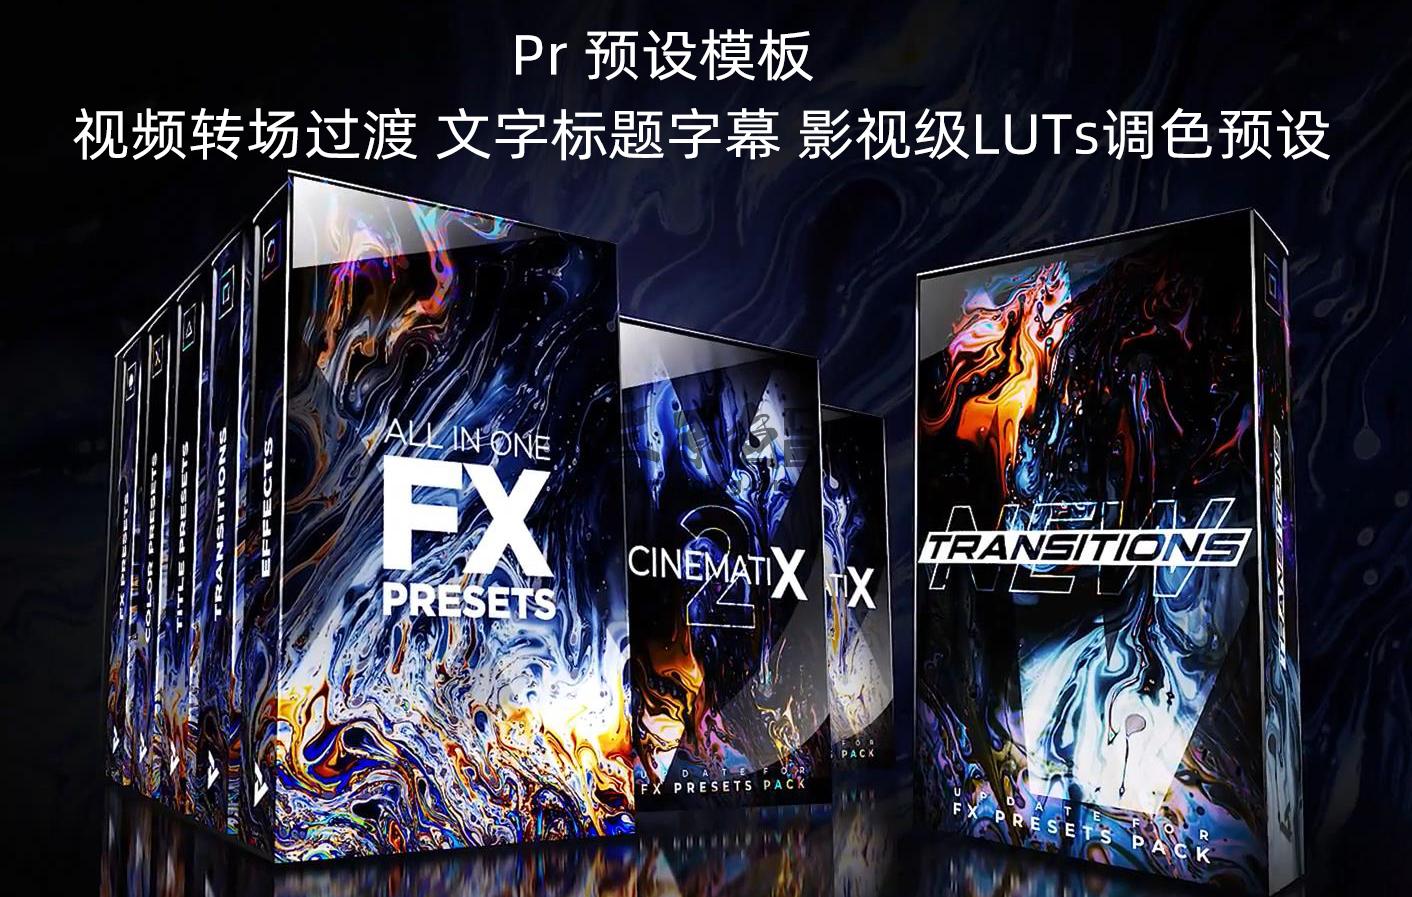 Premiere Pro预设模板 视频转场过渡 文字标题字幕 影视级LUTs调色预设 Pr 模板-第1张